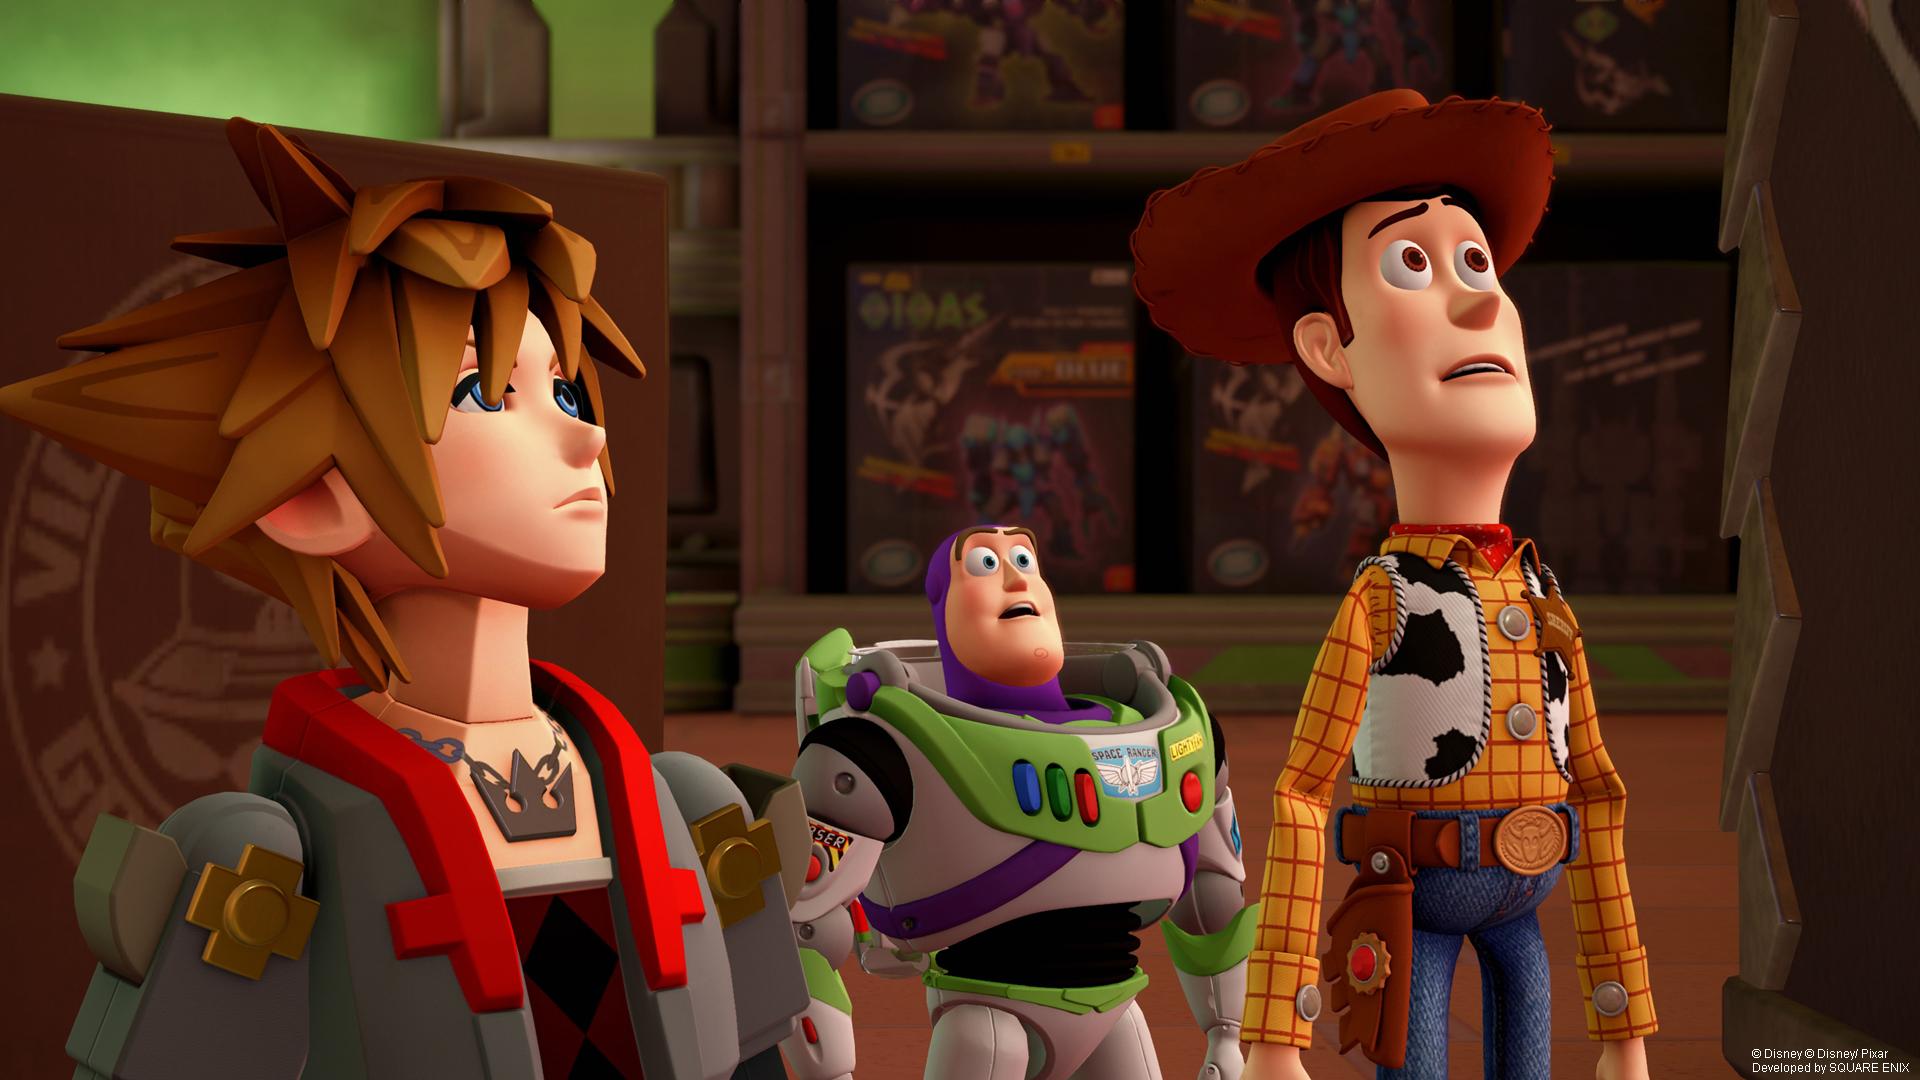 Nomura discusses work on KINGDOM HEARTS, including Pixar properties